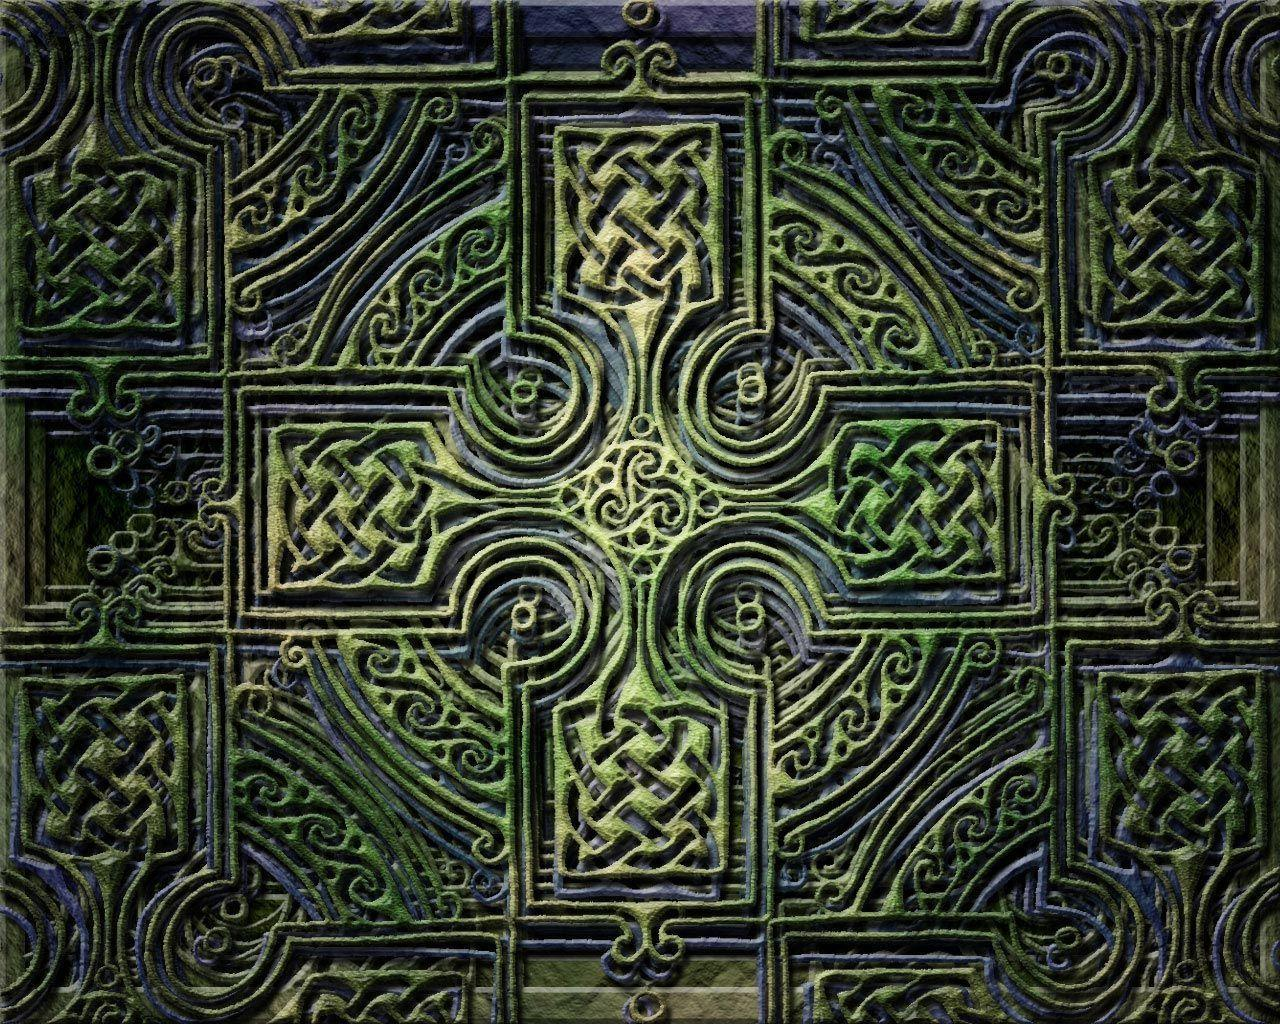 Celtic Cross Wallpapers   Top Celtic Cross Backgrounds 1280x1024